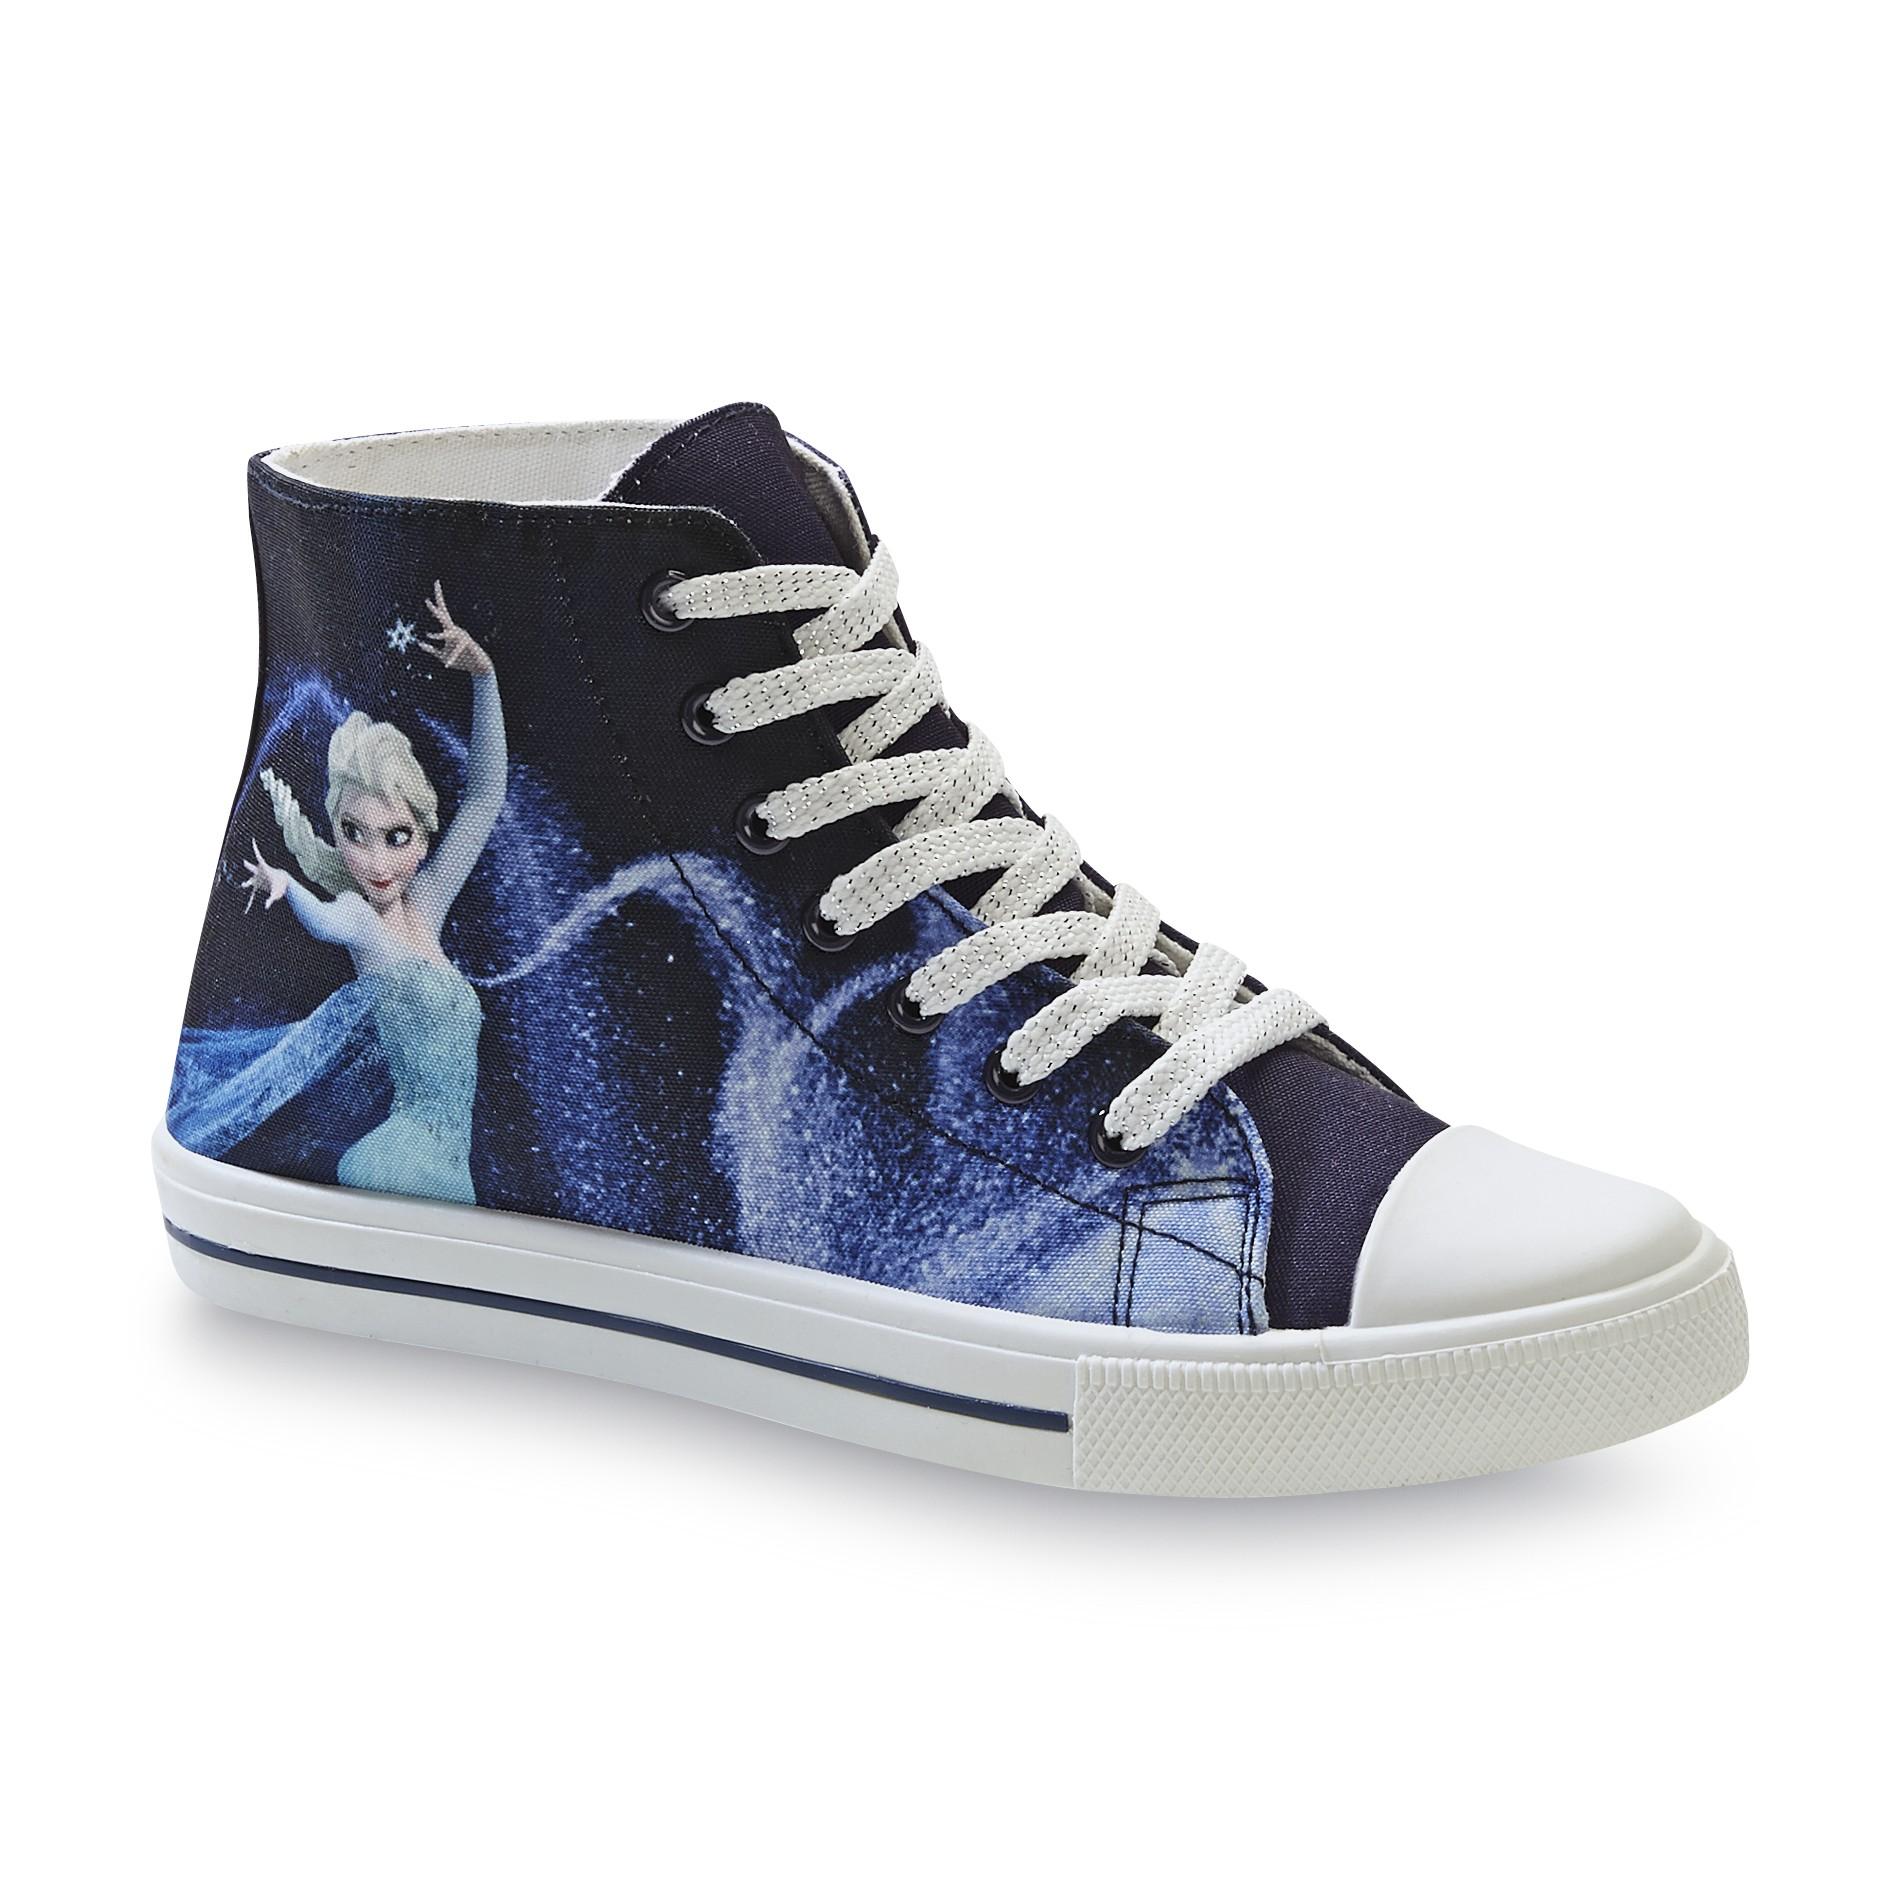 Disney Frozen Womens Blue High Top Sneaker Shoes